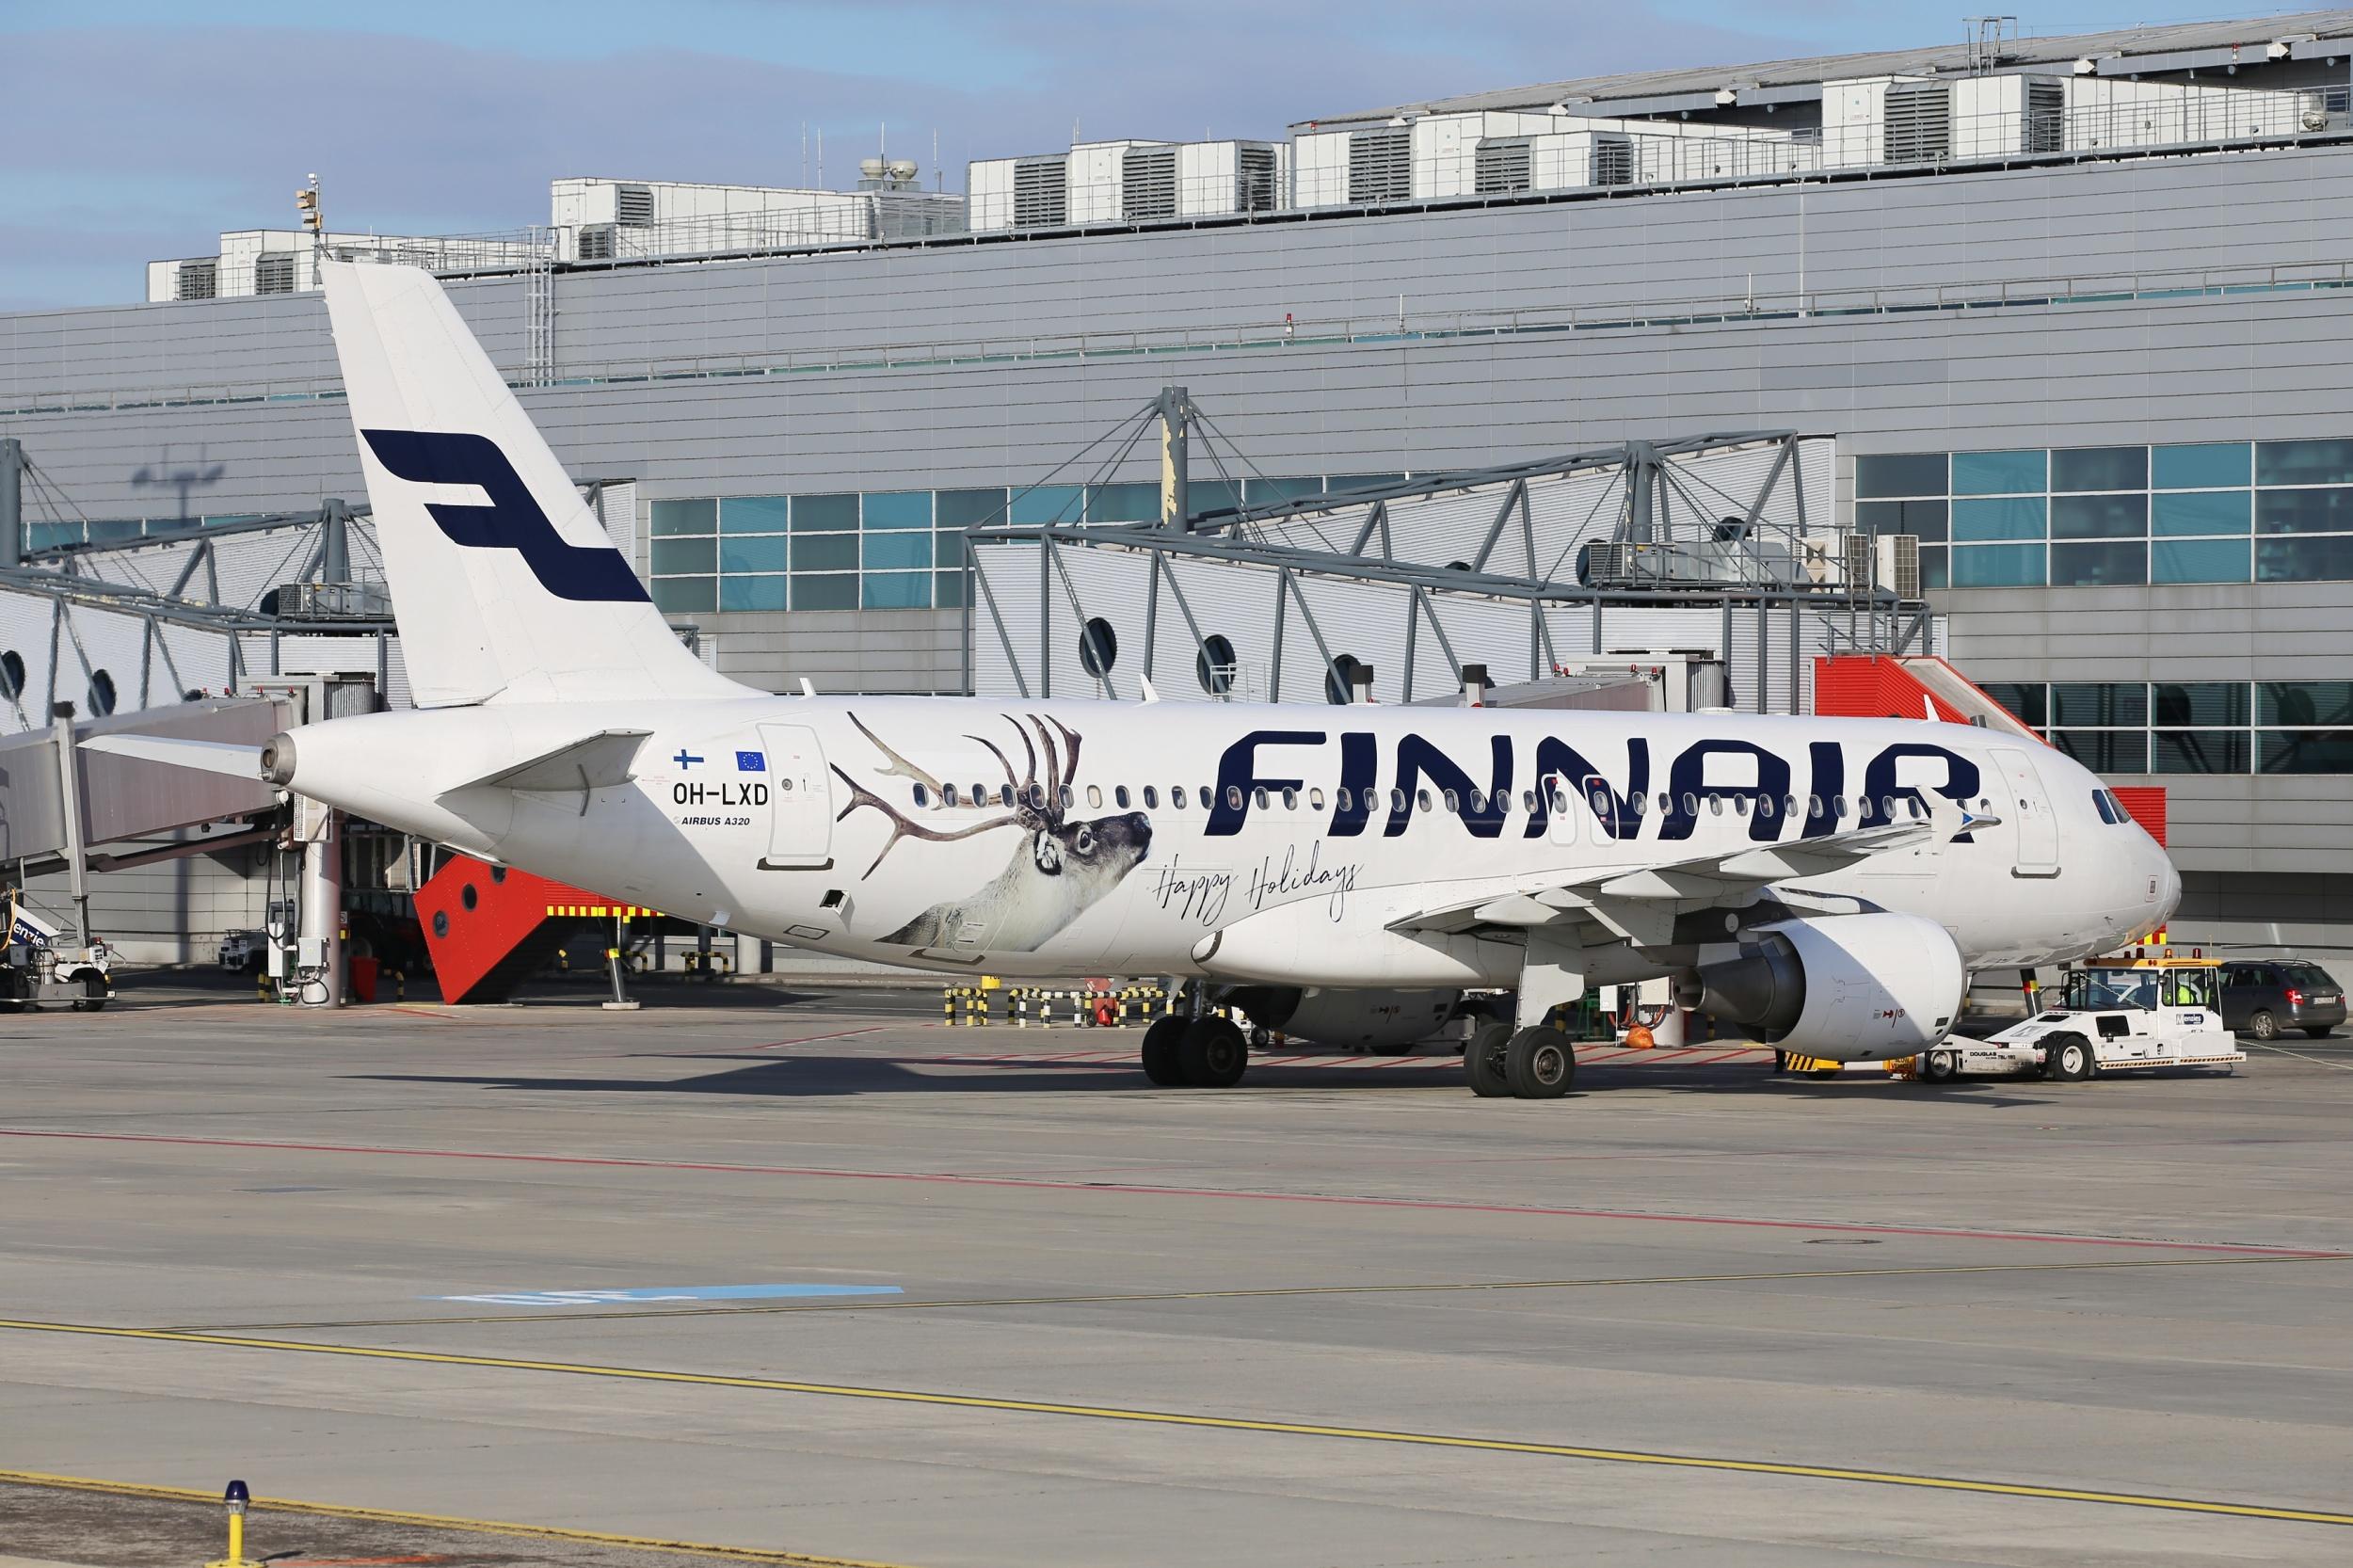 Czech Airlines Technics signs agreement with Finnair